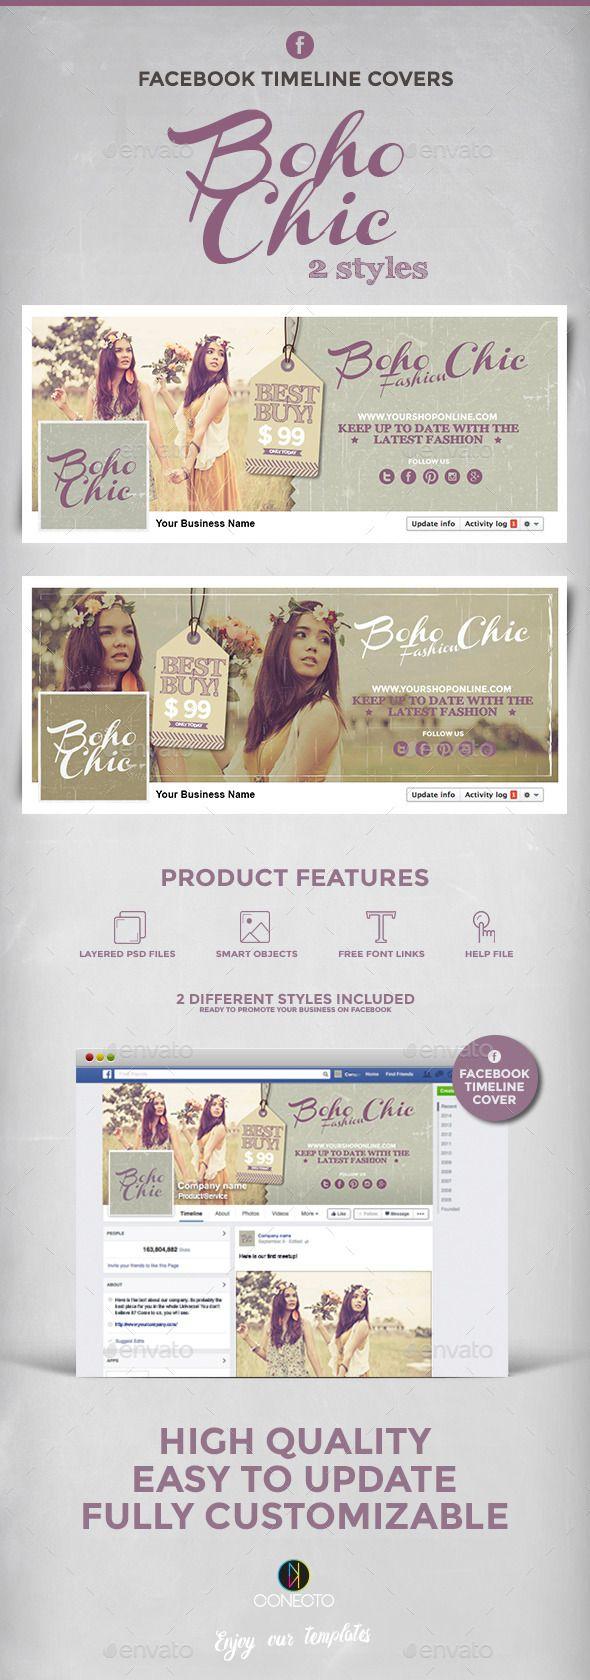 Boho Chic Facebook Timeline Covers Template #design Download: http://graphicriver.net/item/boho-chic-facebook-timeline-covers/12585998?ref=ksioks